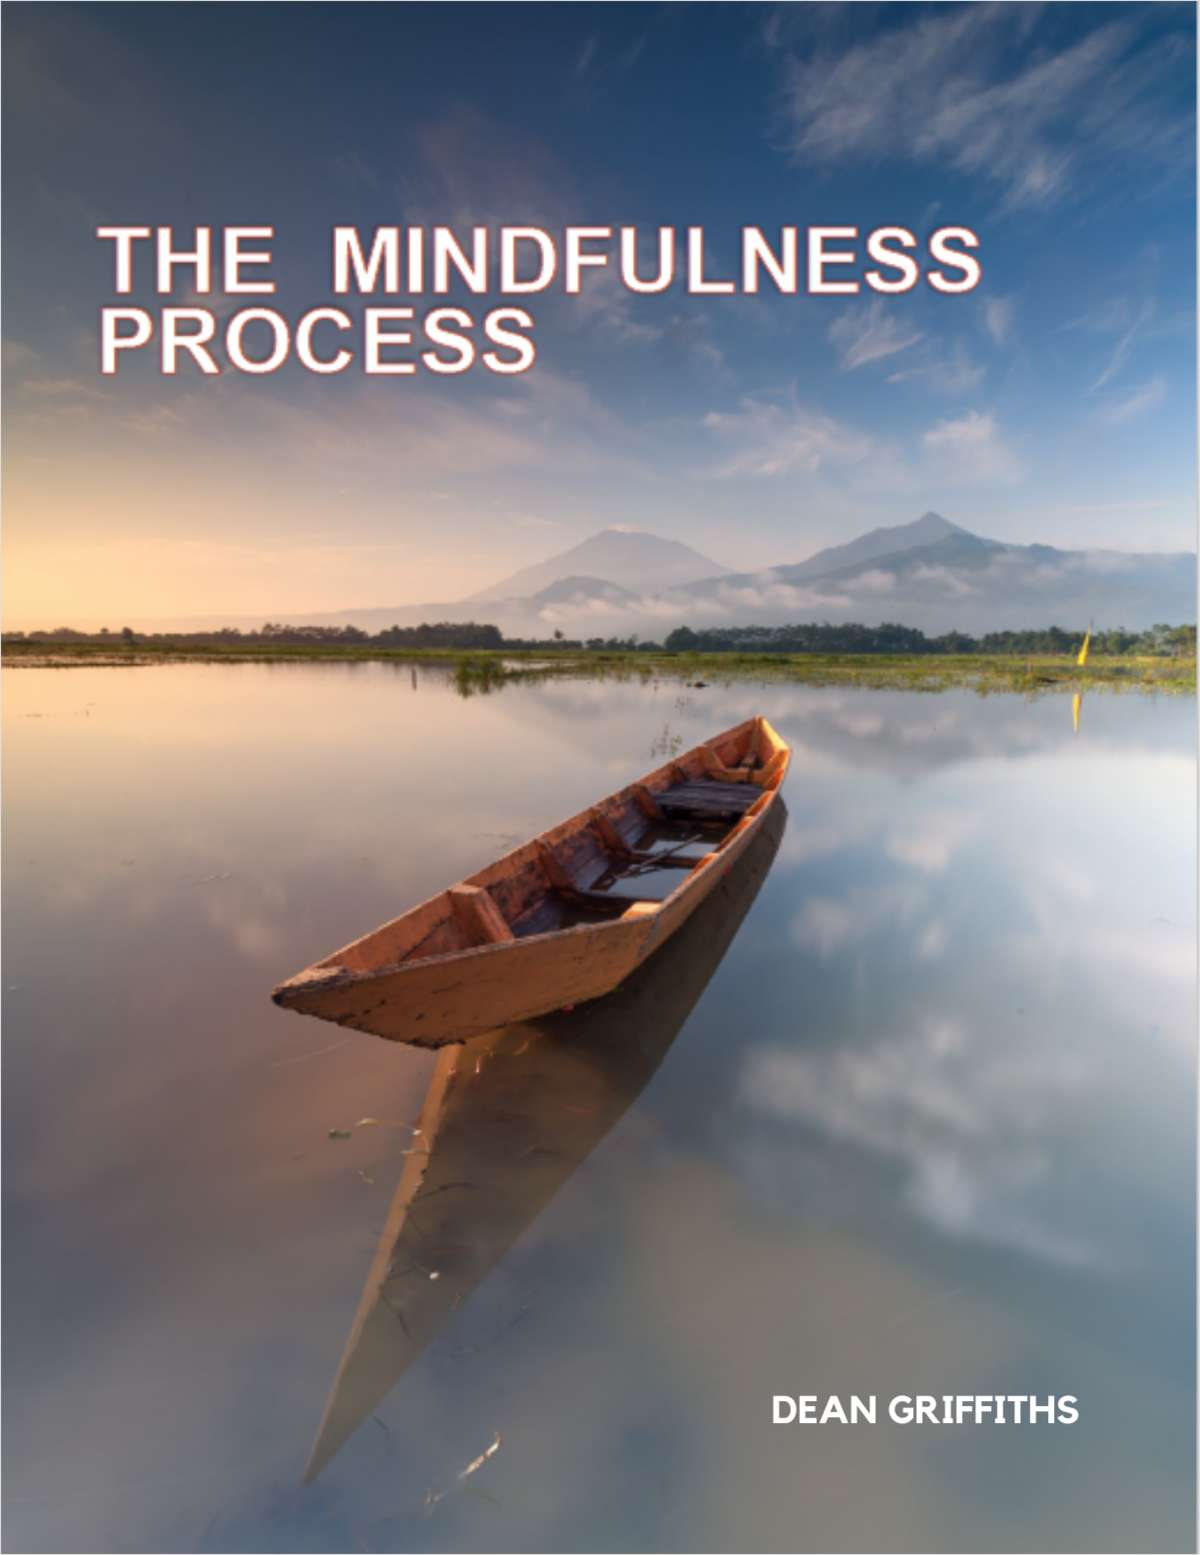 The Mindfulness Process